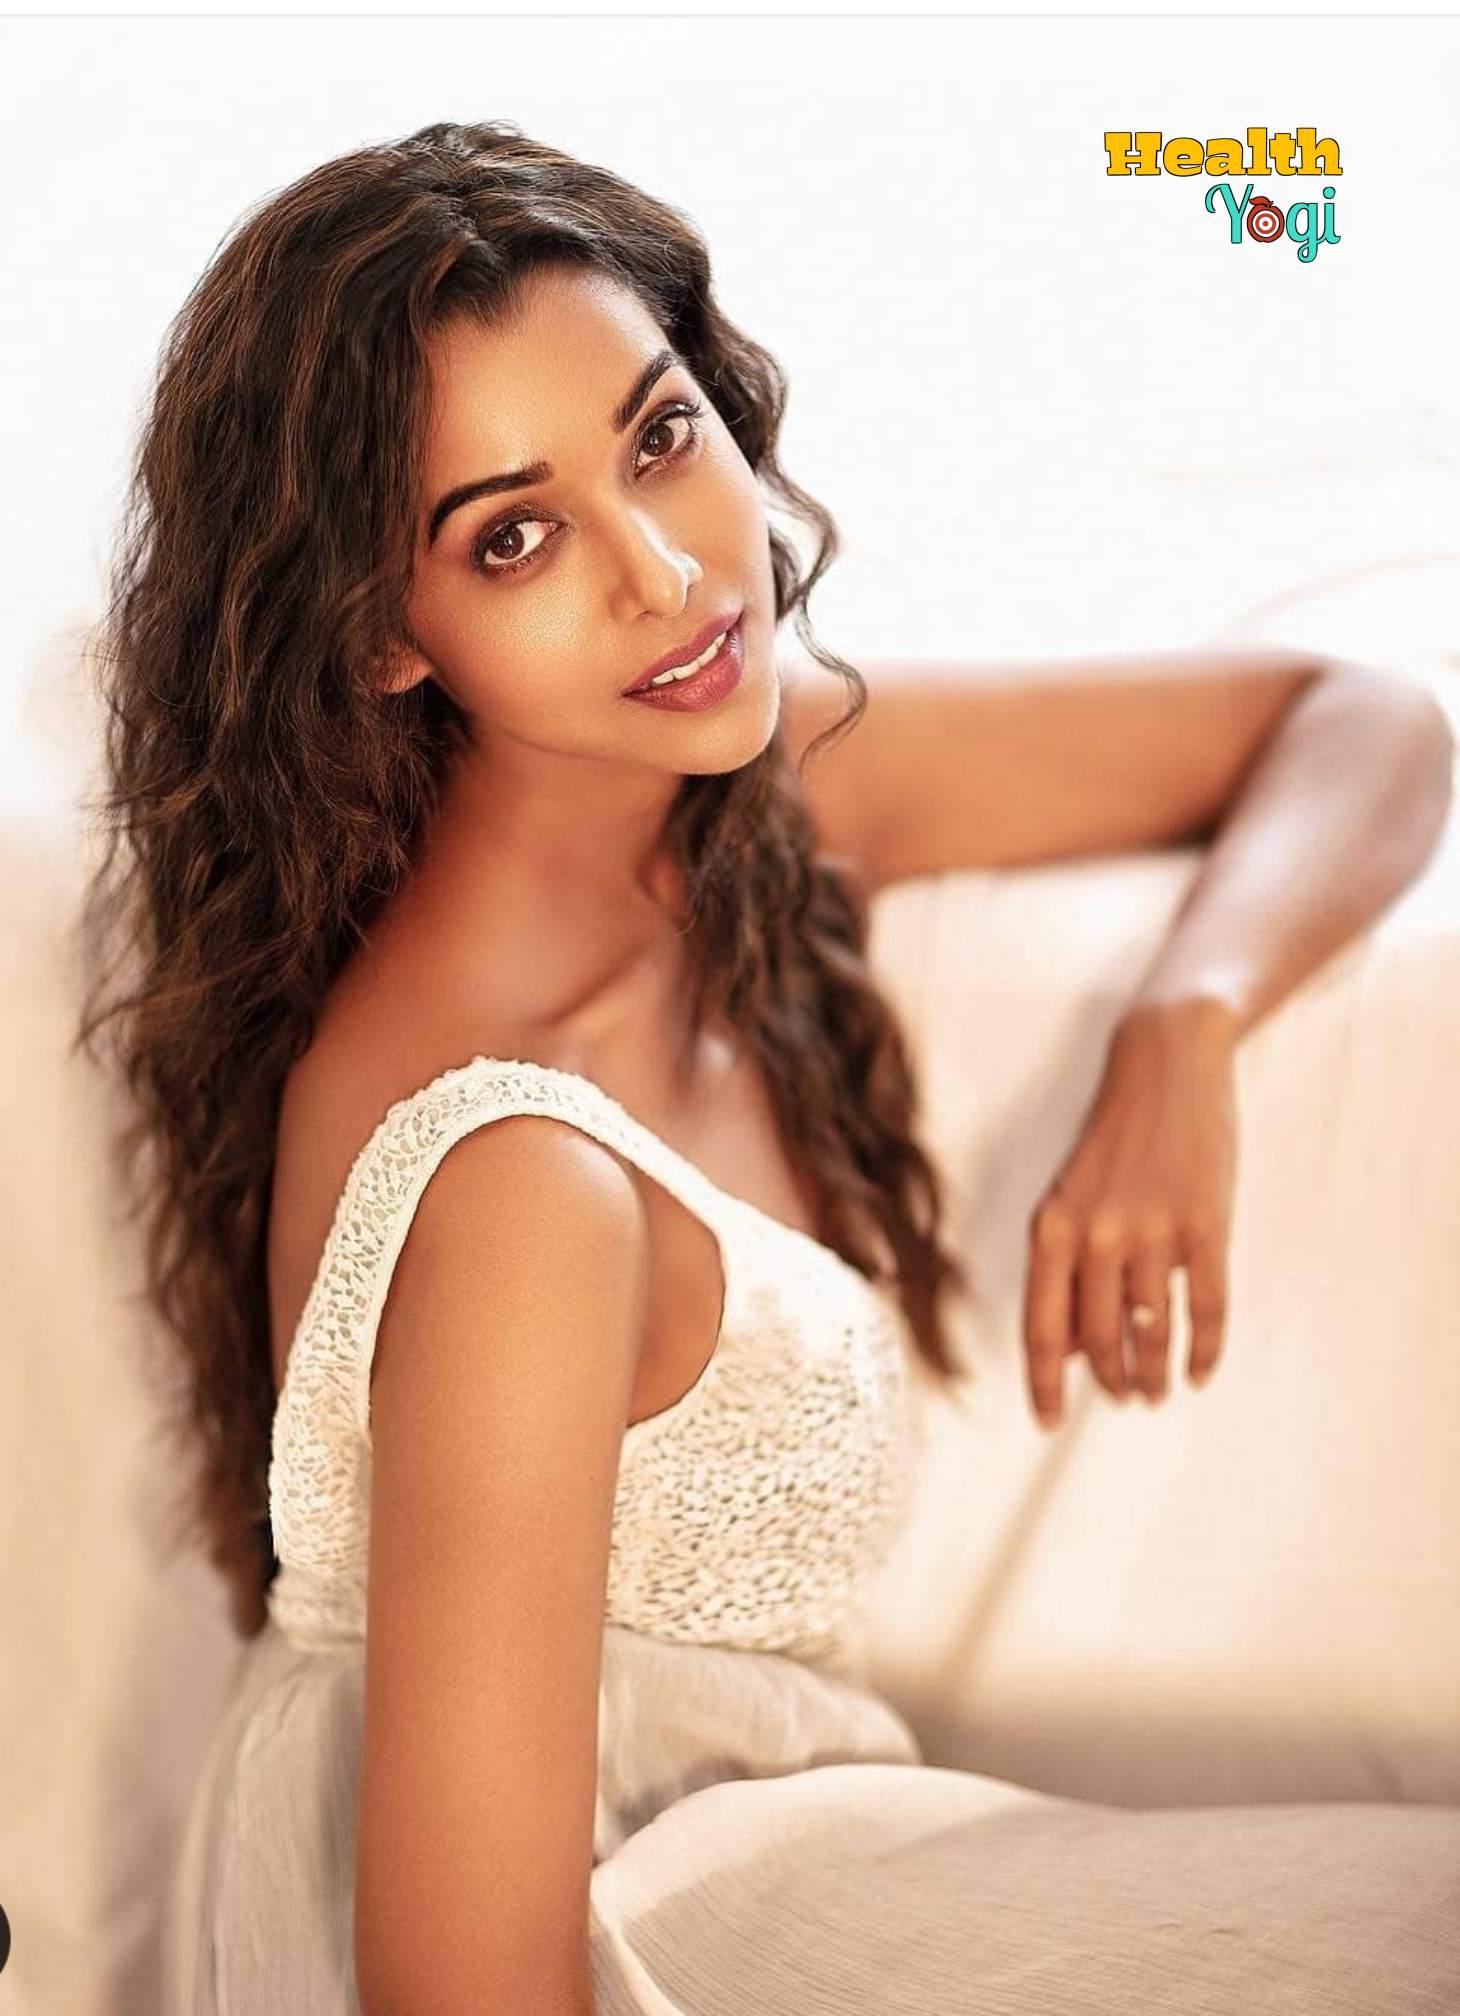 Anupriya Goenka diet plan, workout routine and beauty secrets